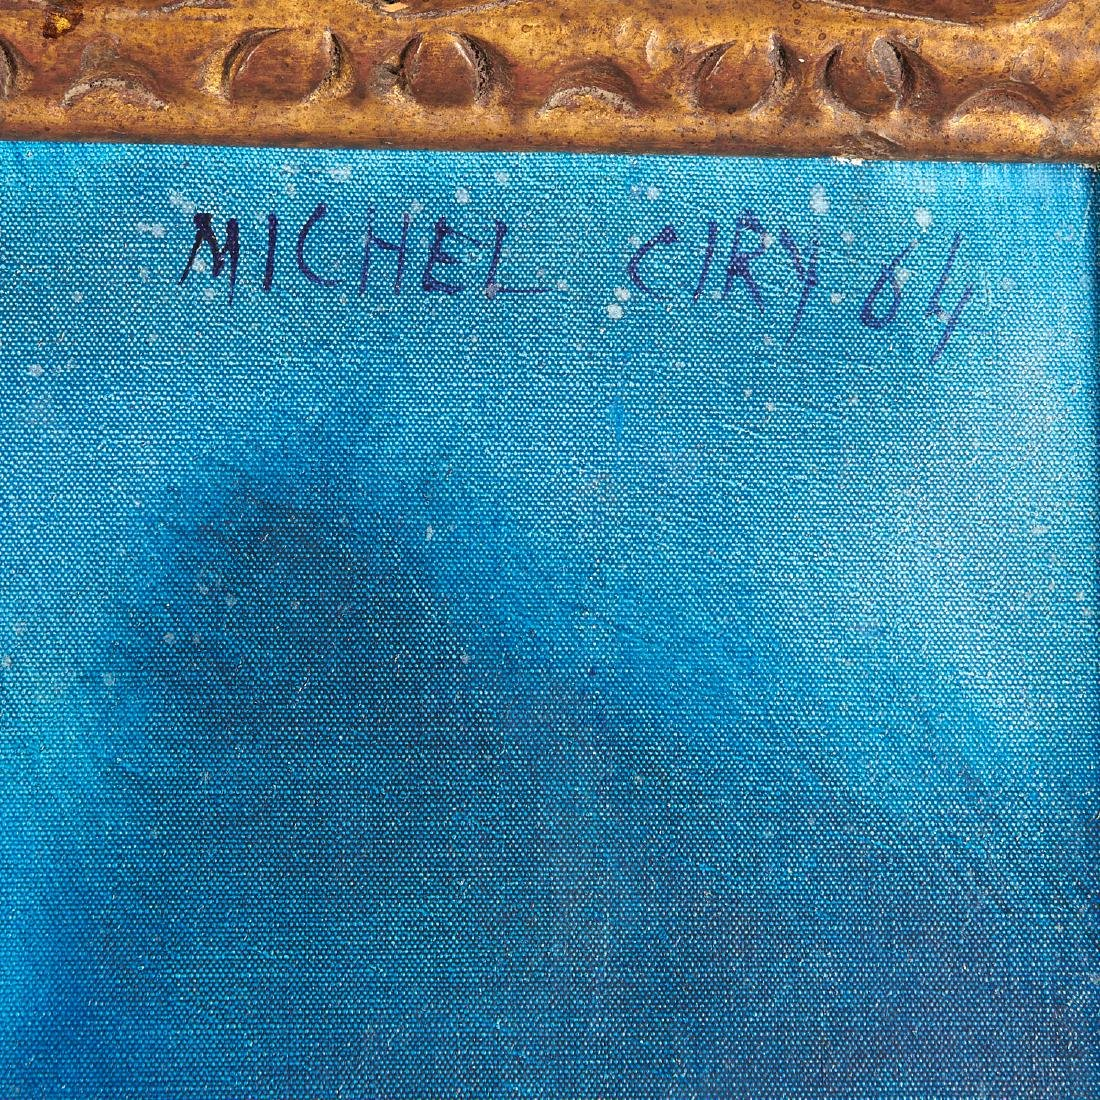 Michel Ciry, painting, 1964 - 6